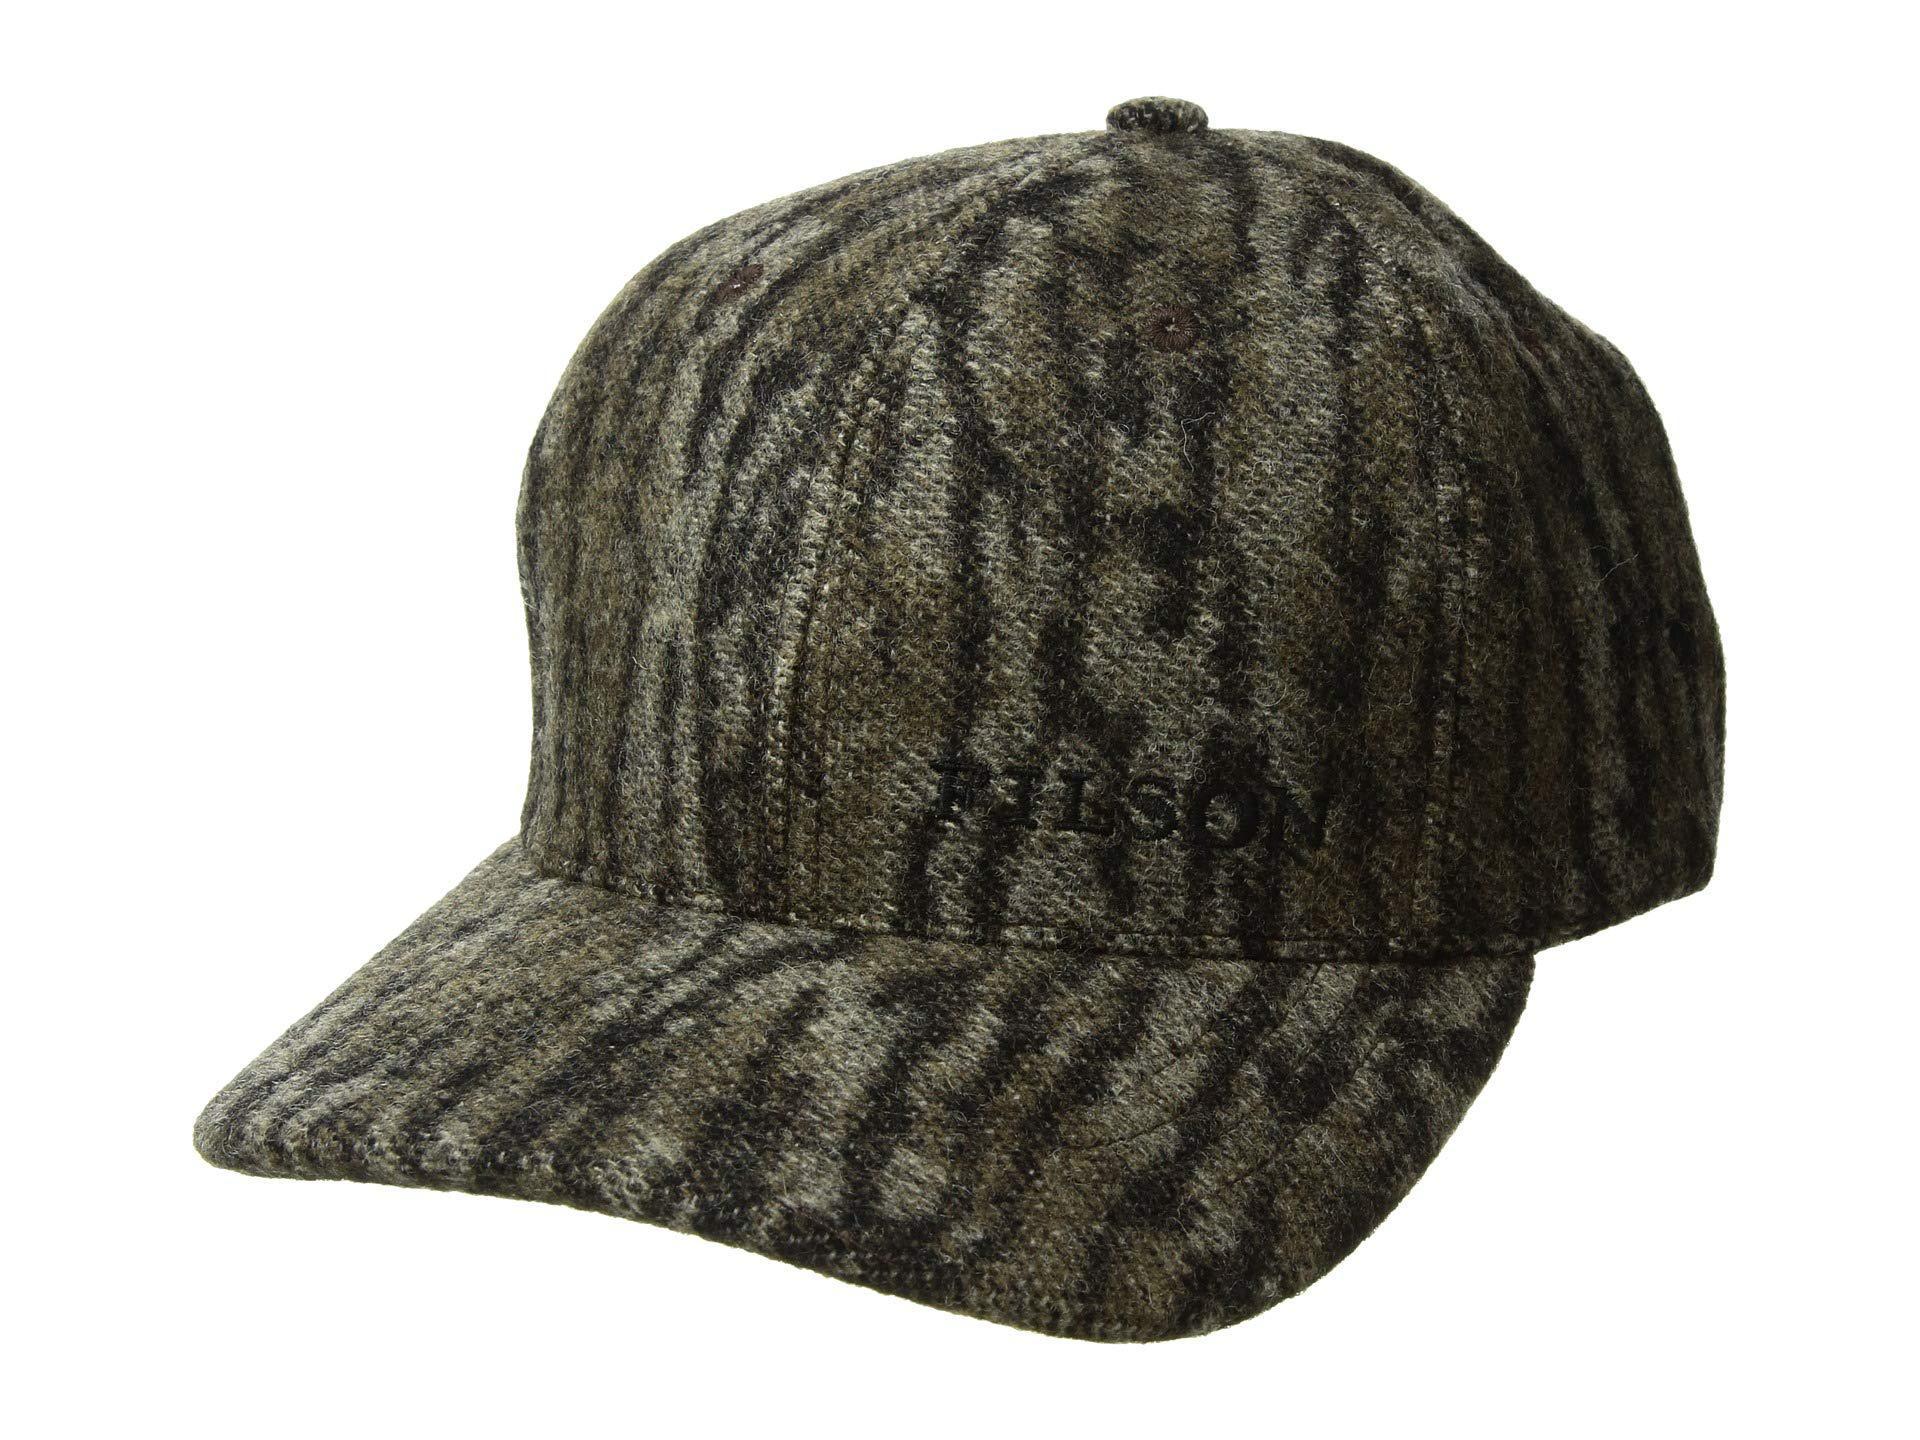 b1caf83a0b2 Lyst - Filson Wool Logger Cap (bottom Land) Caps for Men